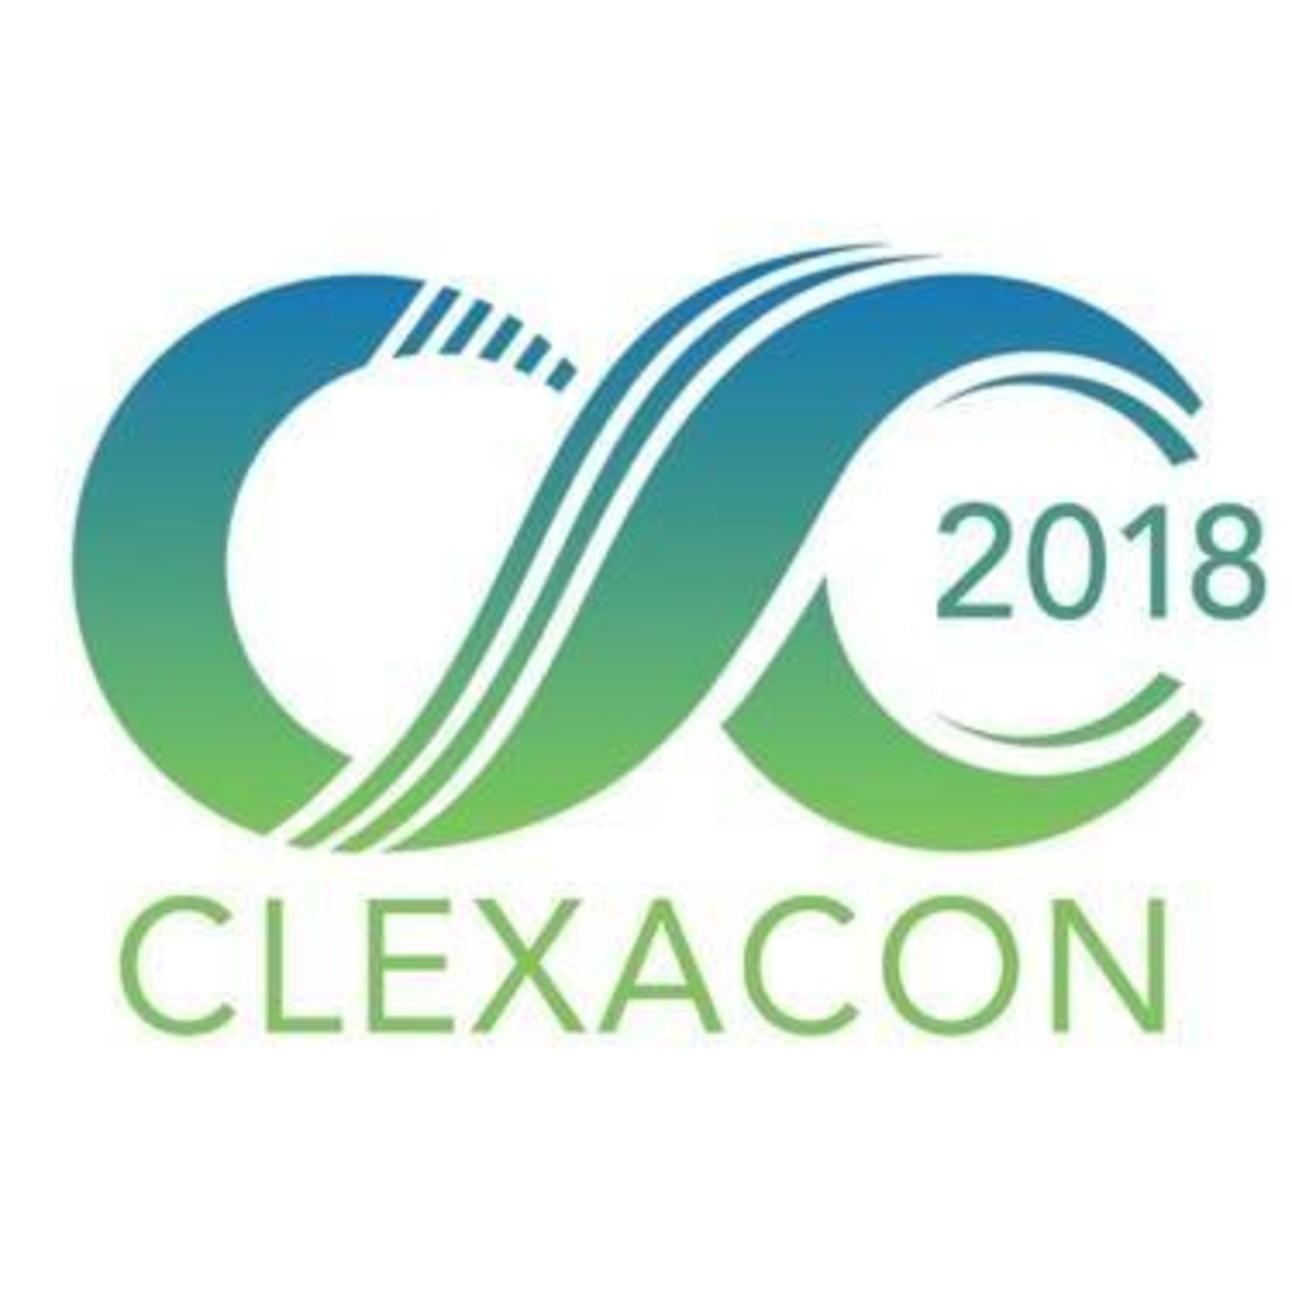 ClexaCon.jpg